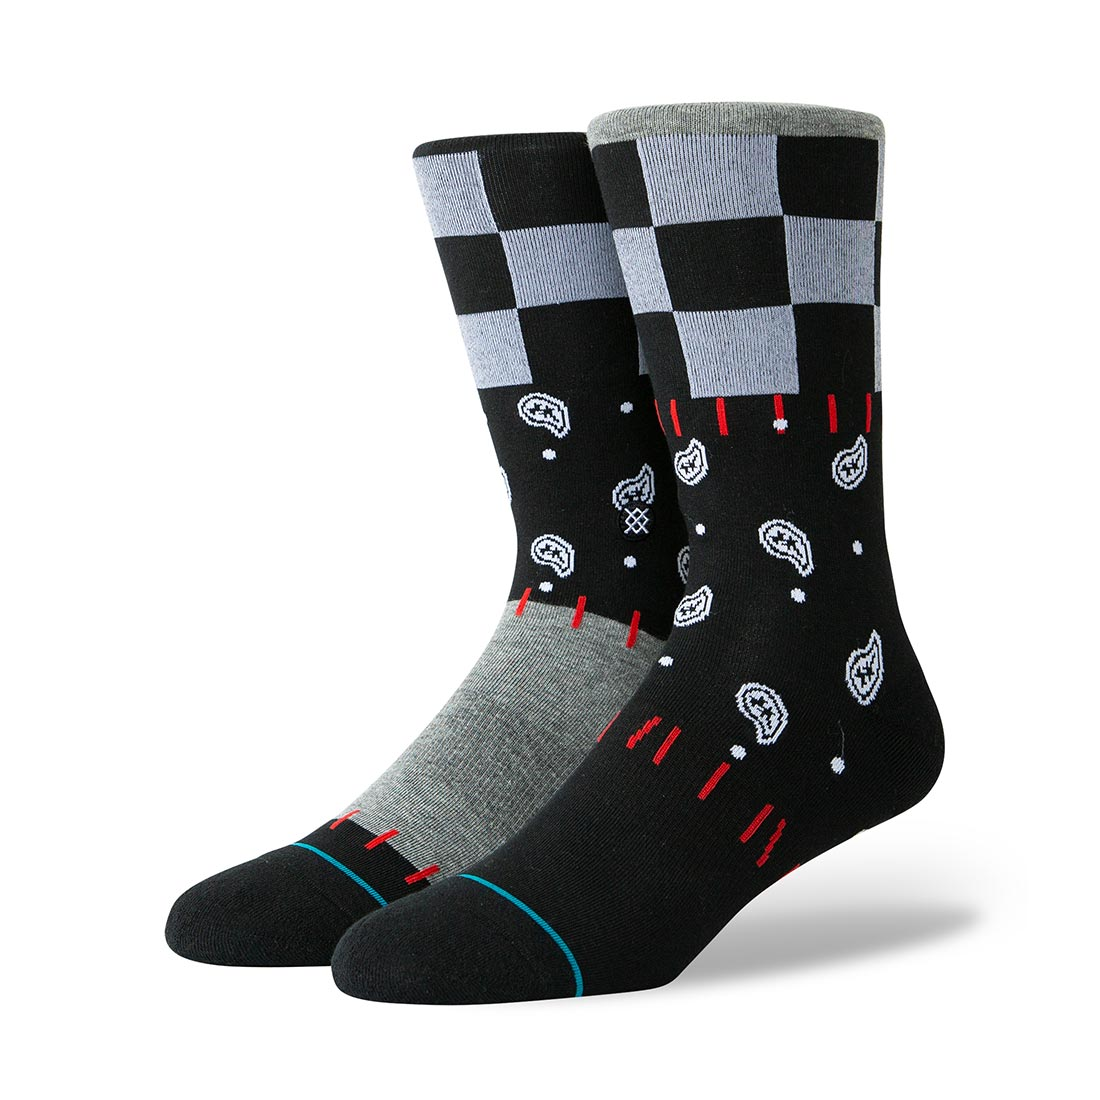 Stance Discontent Socks - Black